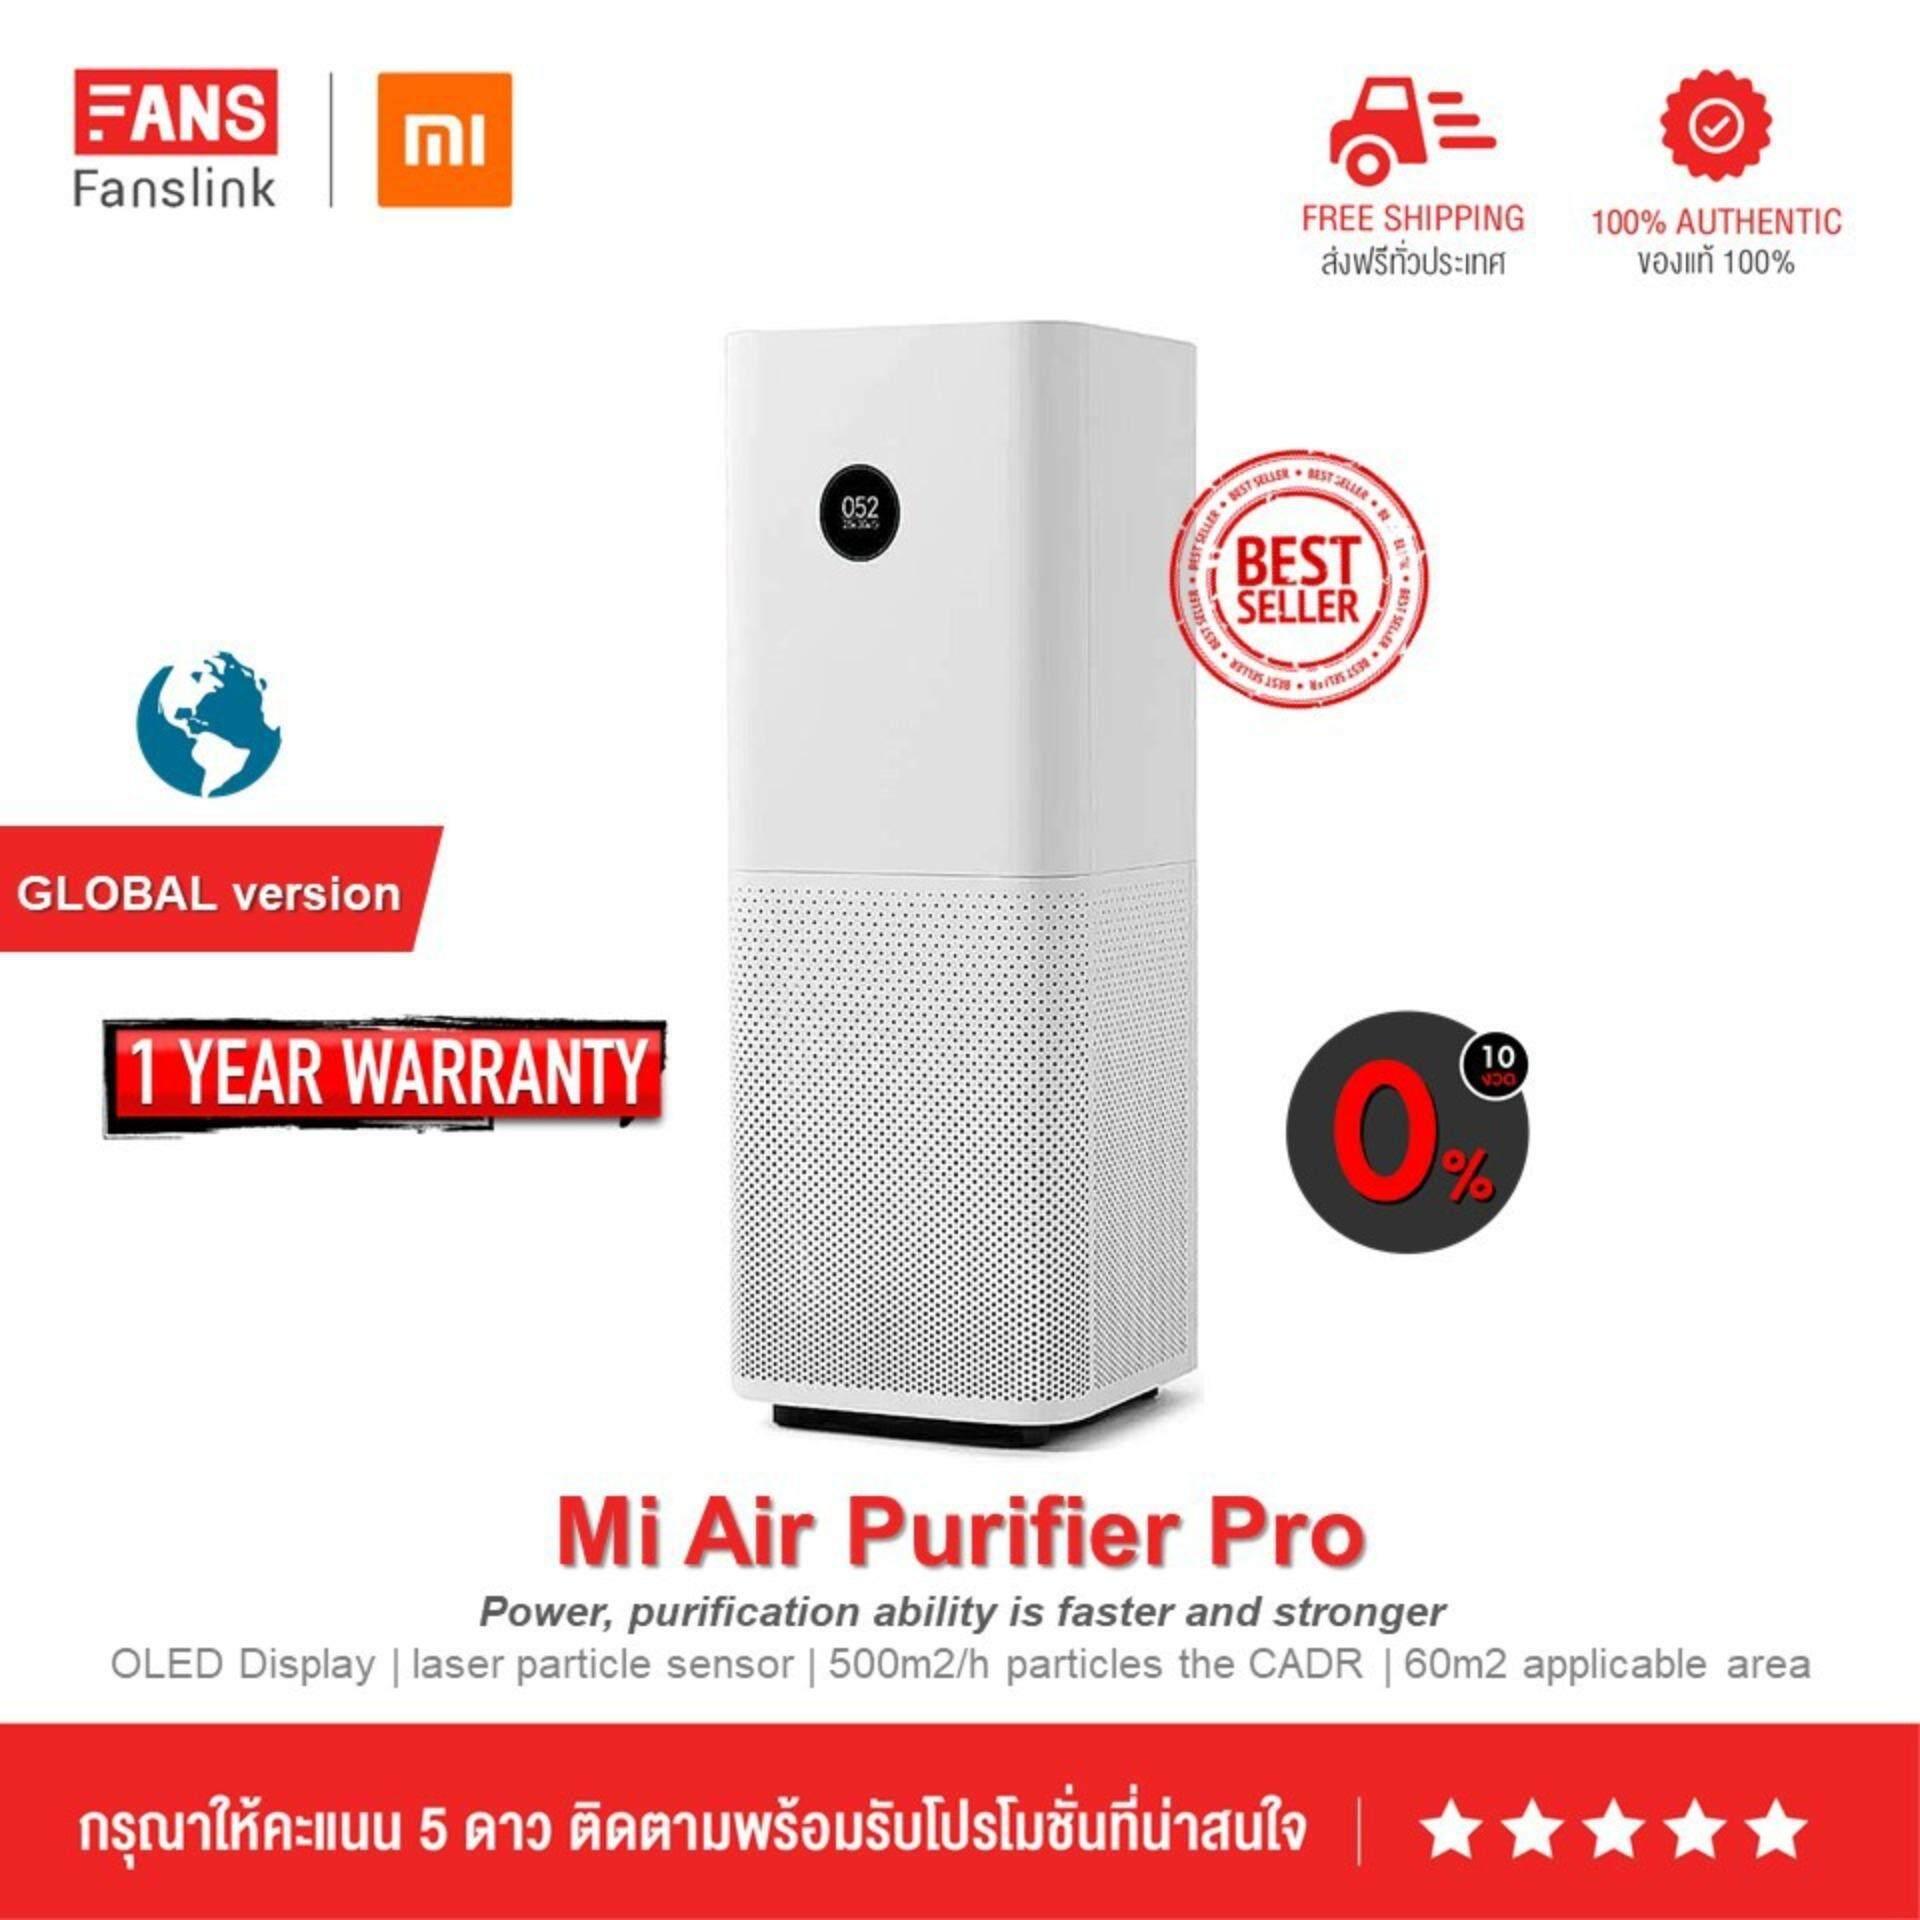 Mi Air Purifier Pro เครื่องฟอกอากาศ by Fanslink Ehome Global Version รับประกันศูนย์ แนะนำ 9 ไอเทมน่าสนใจของ Xiaomi - แนะนำ 9 ไอเทมน่าสนใจของ Xiaomi